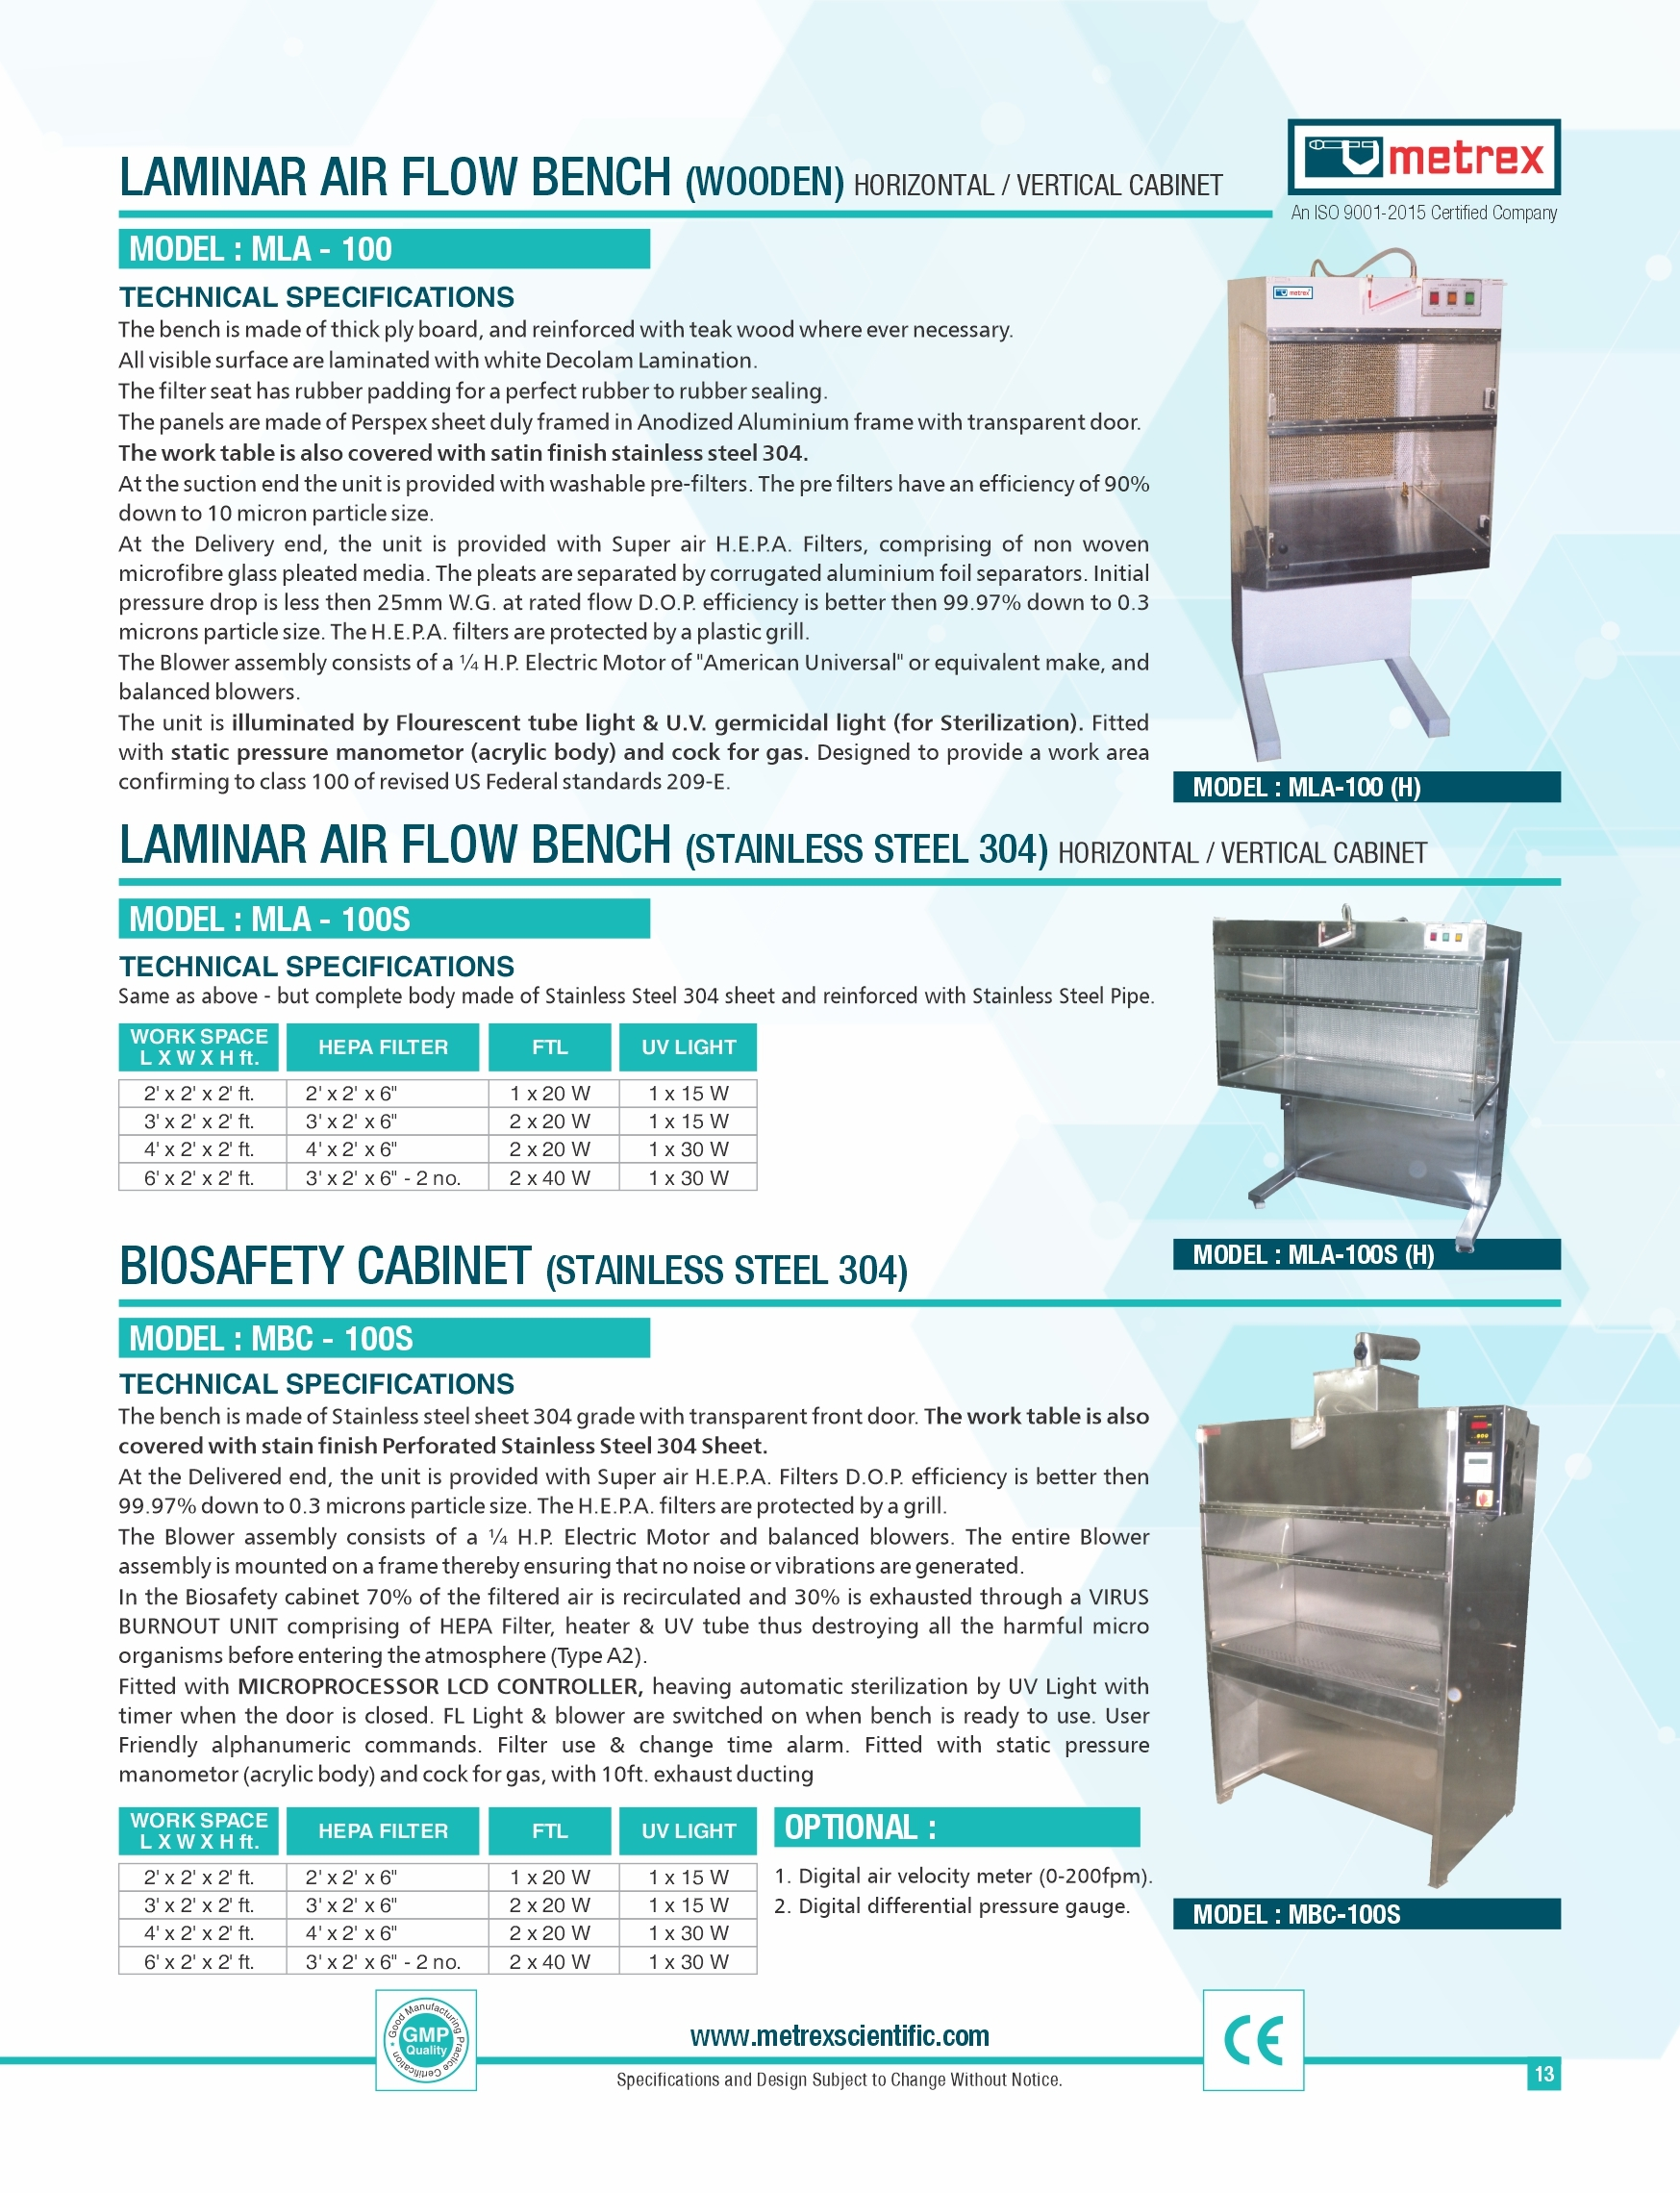 Laminar Air Flow Bench ( Wooden )